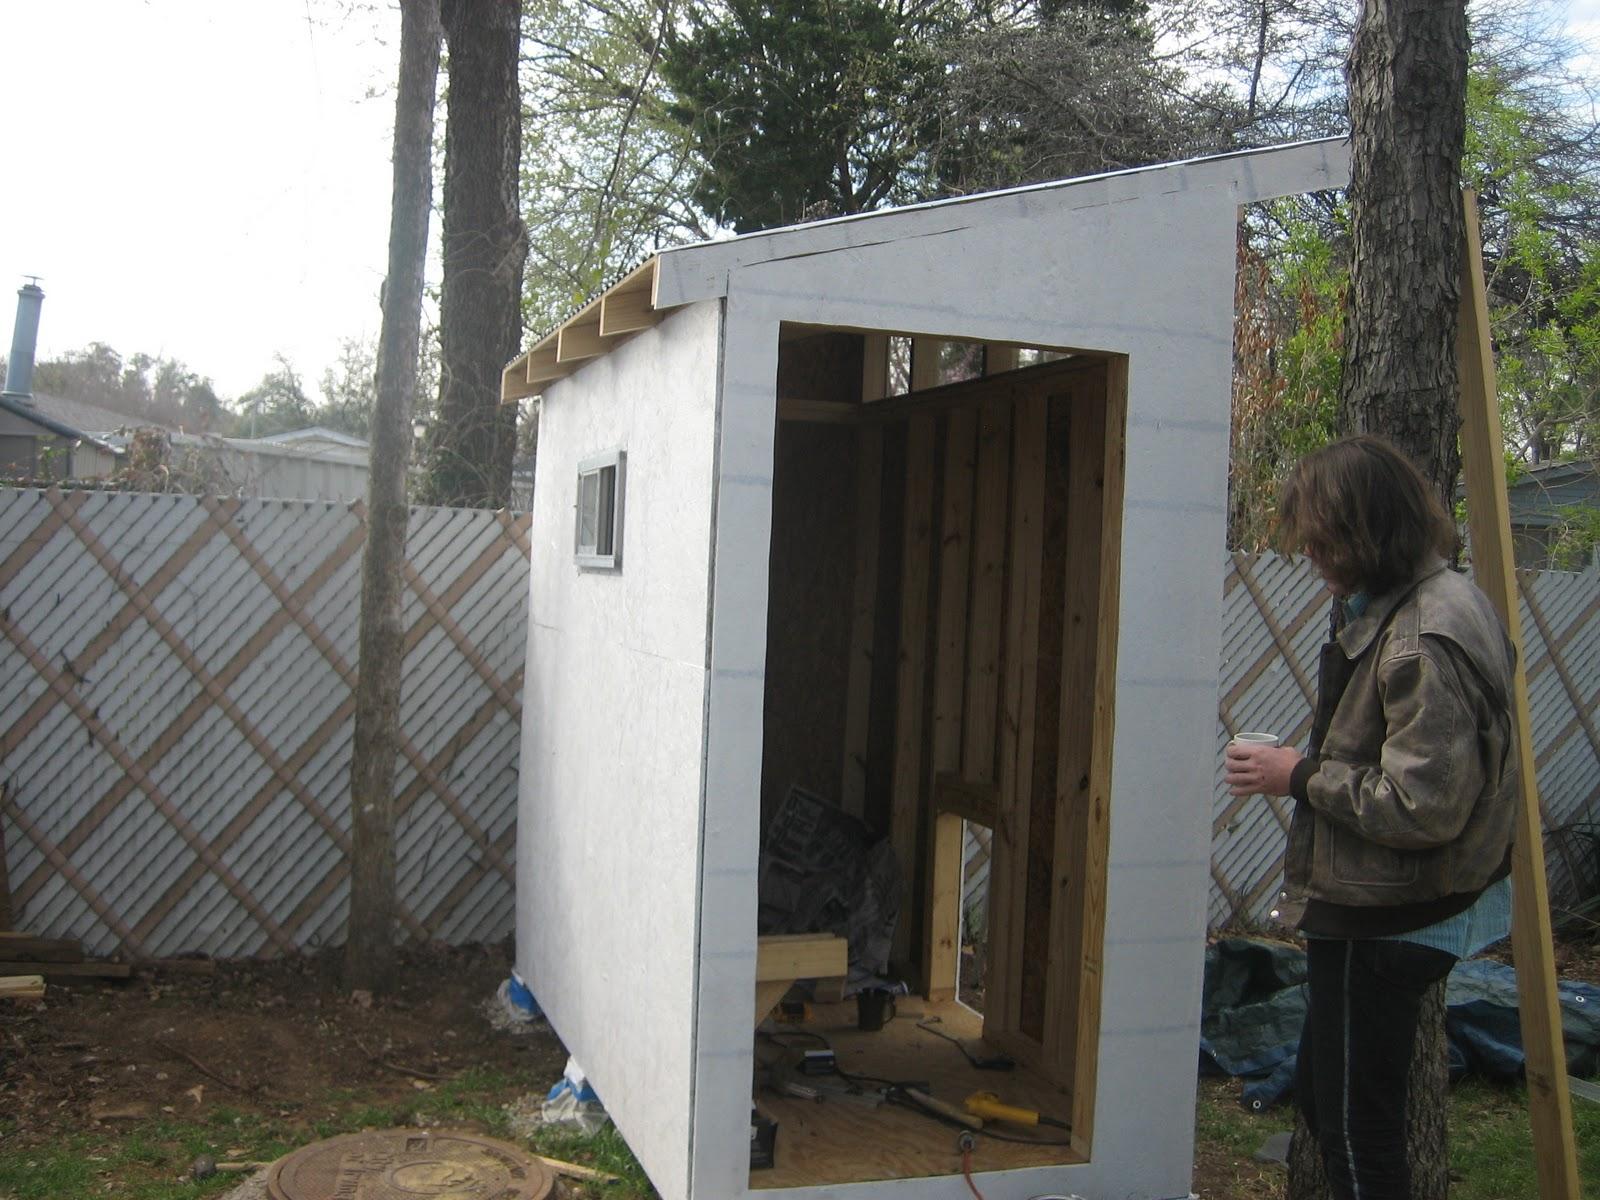 Building A Chicken Coop In Dallas Texas In My Parents